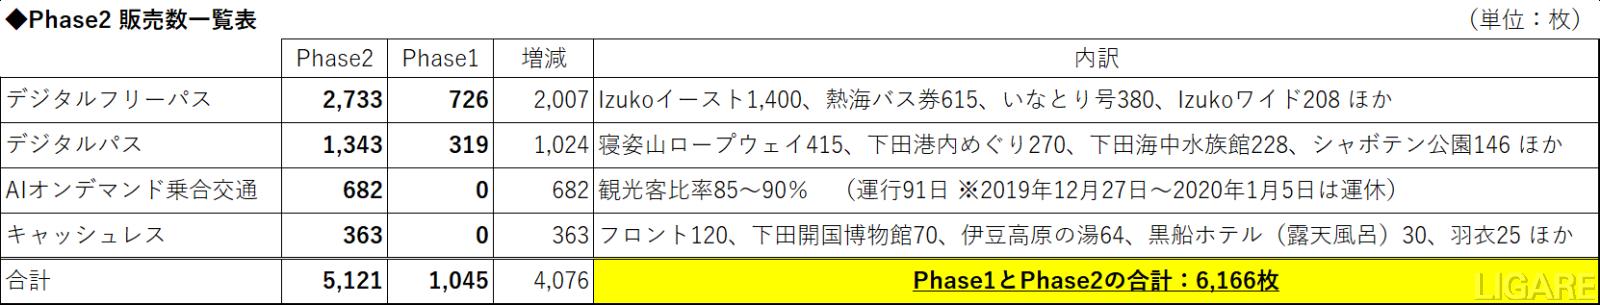 Izuko Phase2実証での販売数一覧表